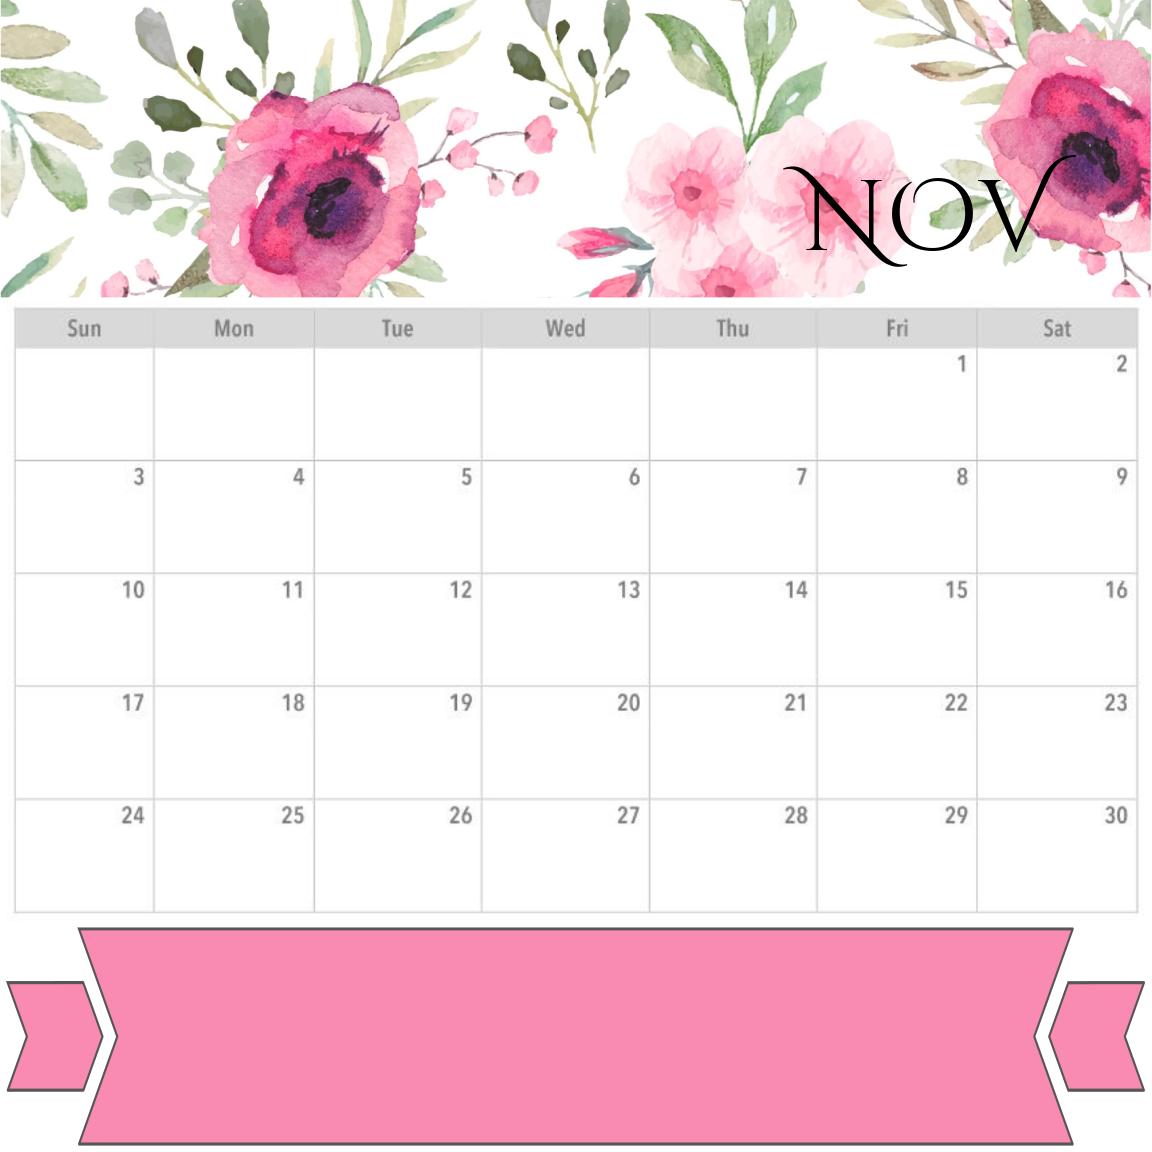 November 2019 Floral Calendar